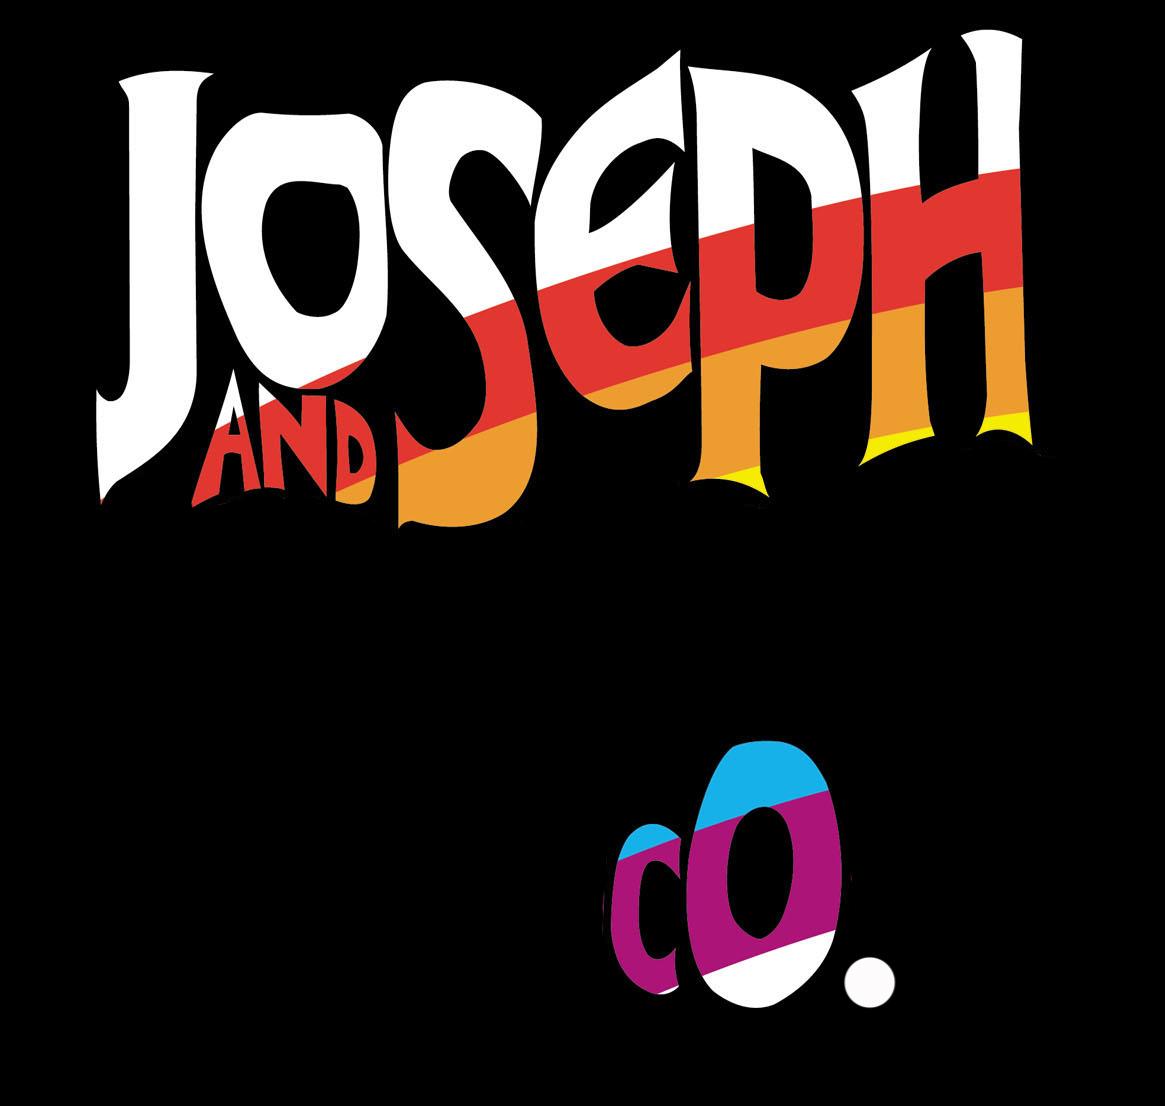 Joseph Co